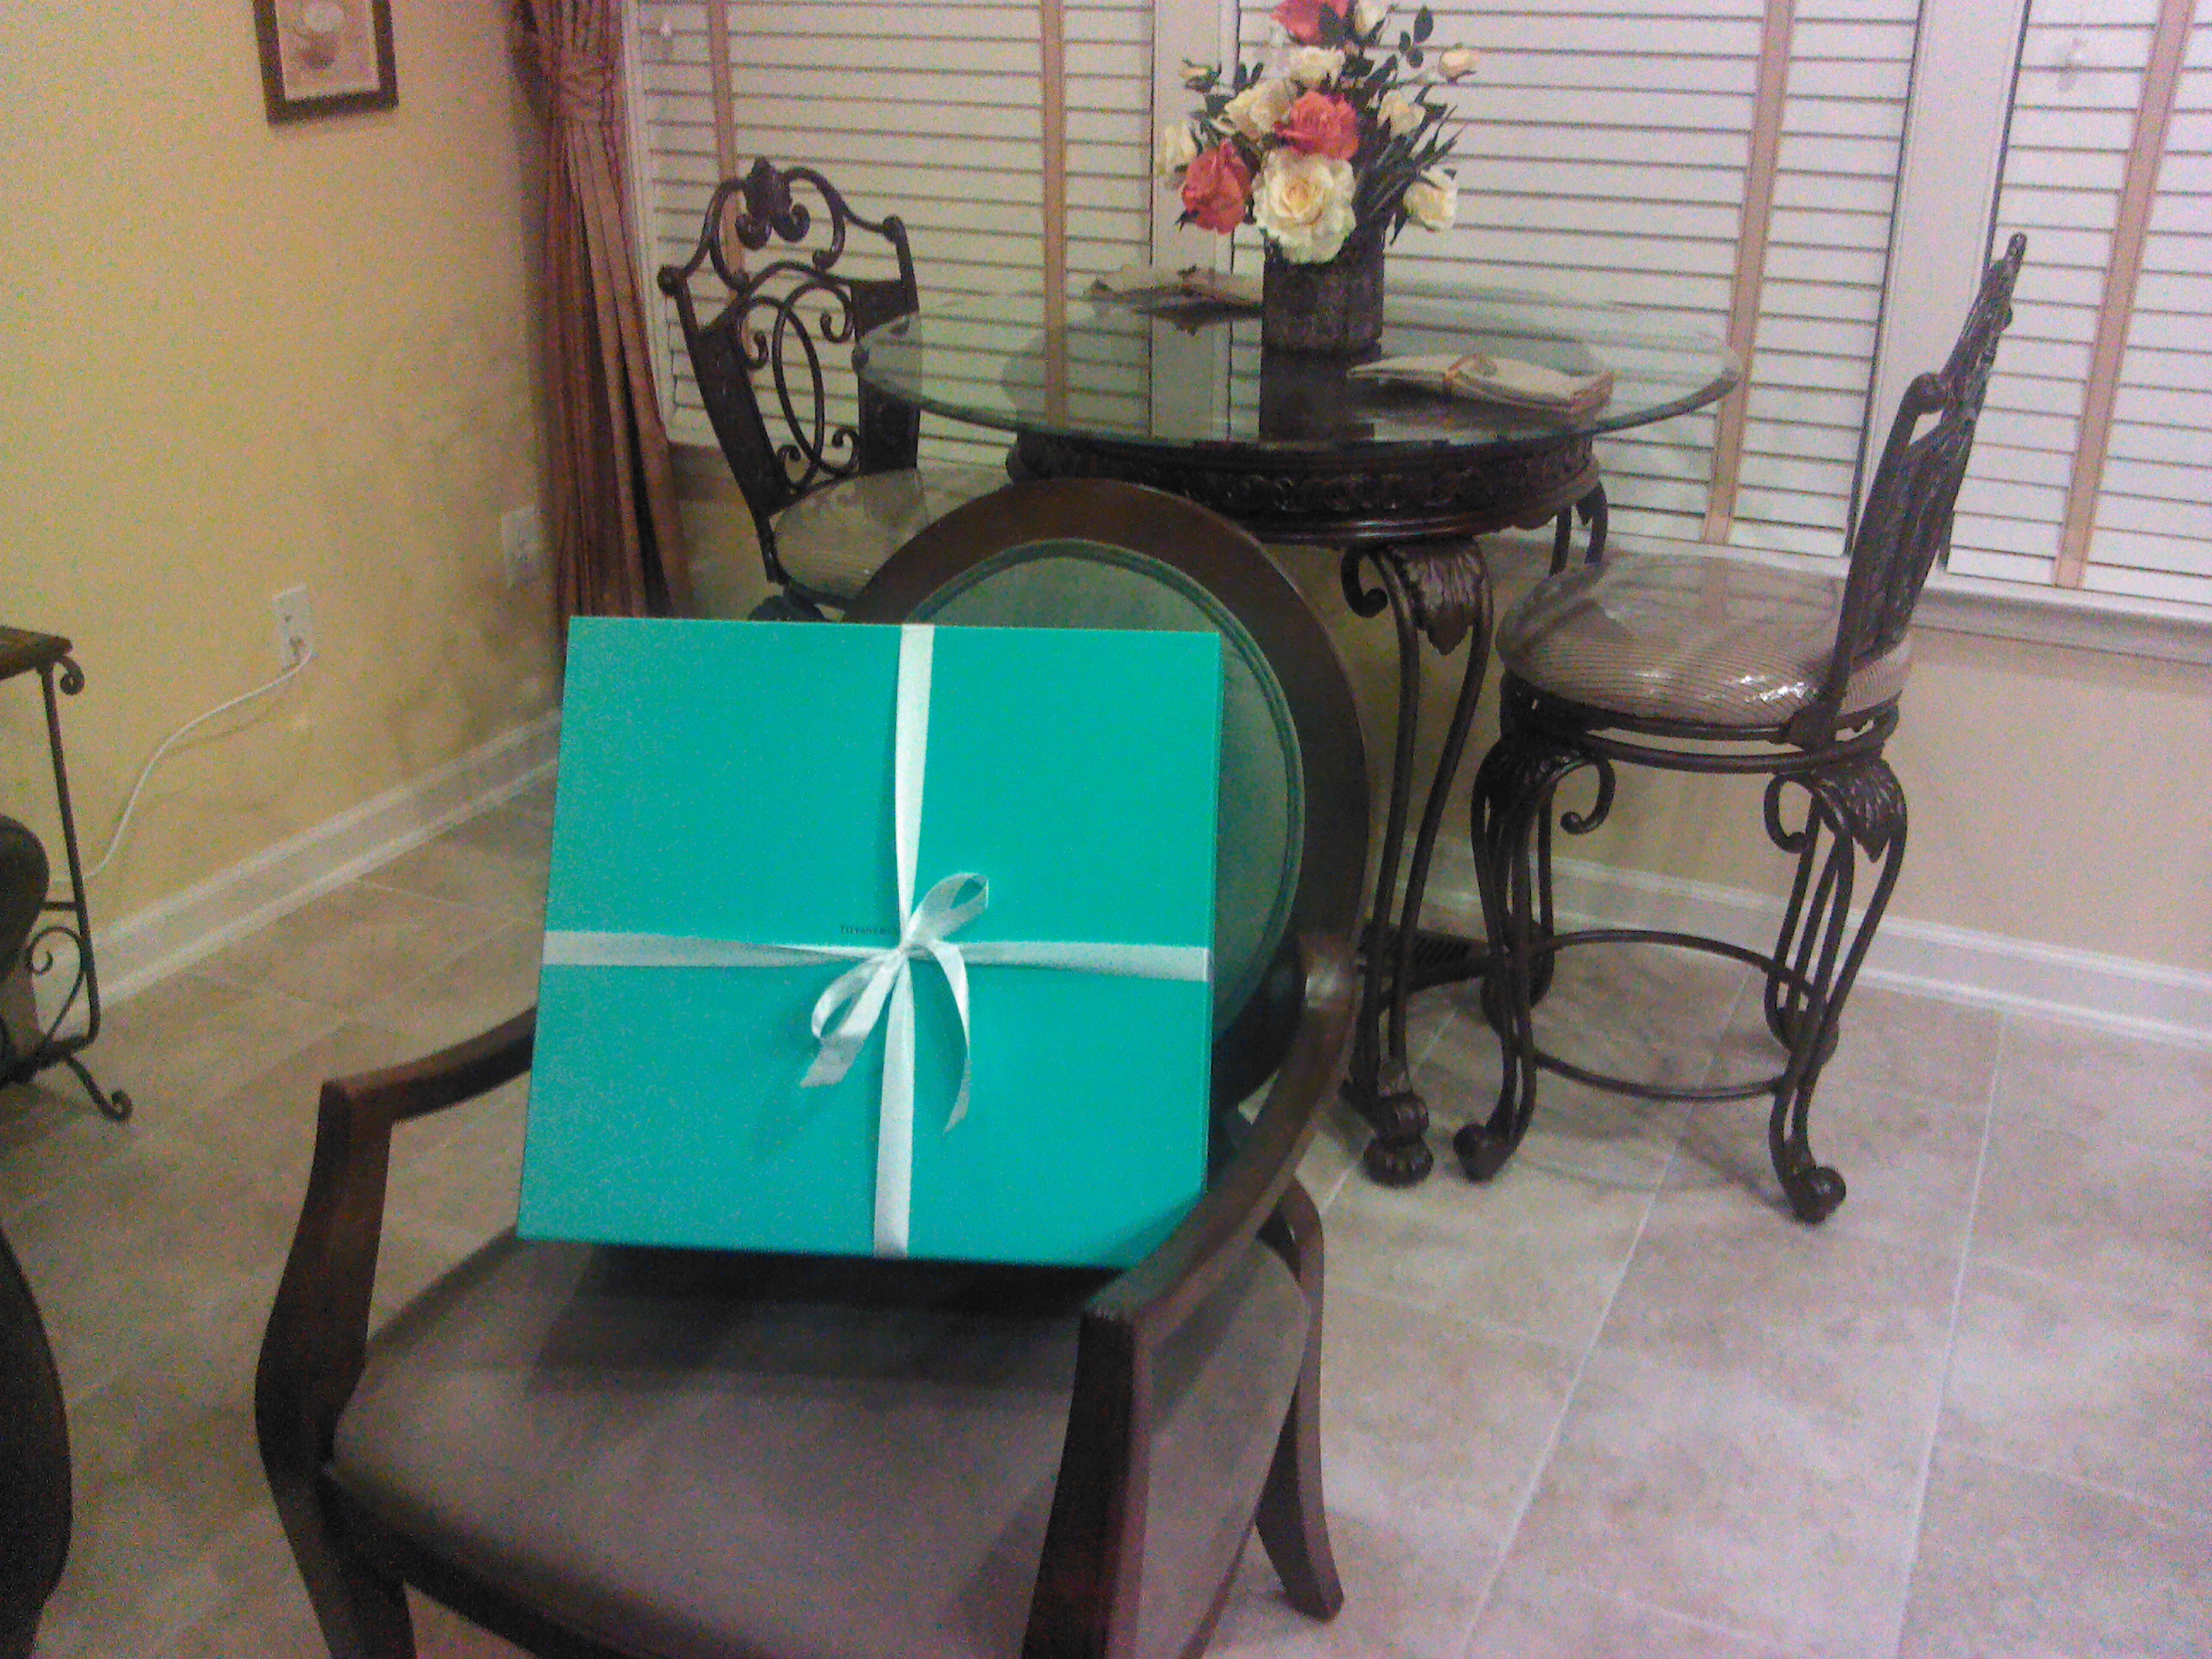 Big, Blue Tiffany Box